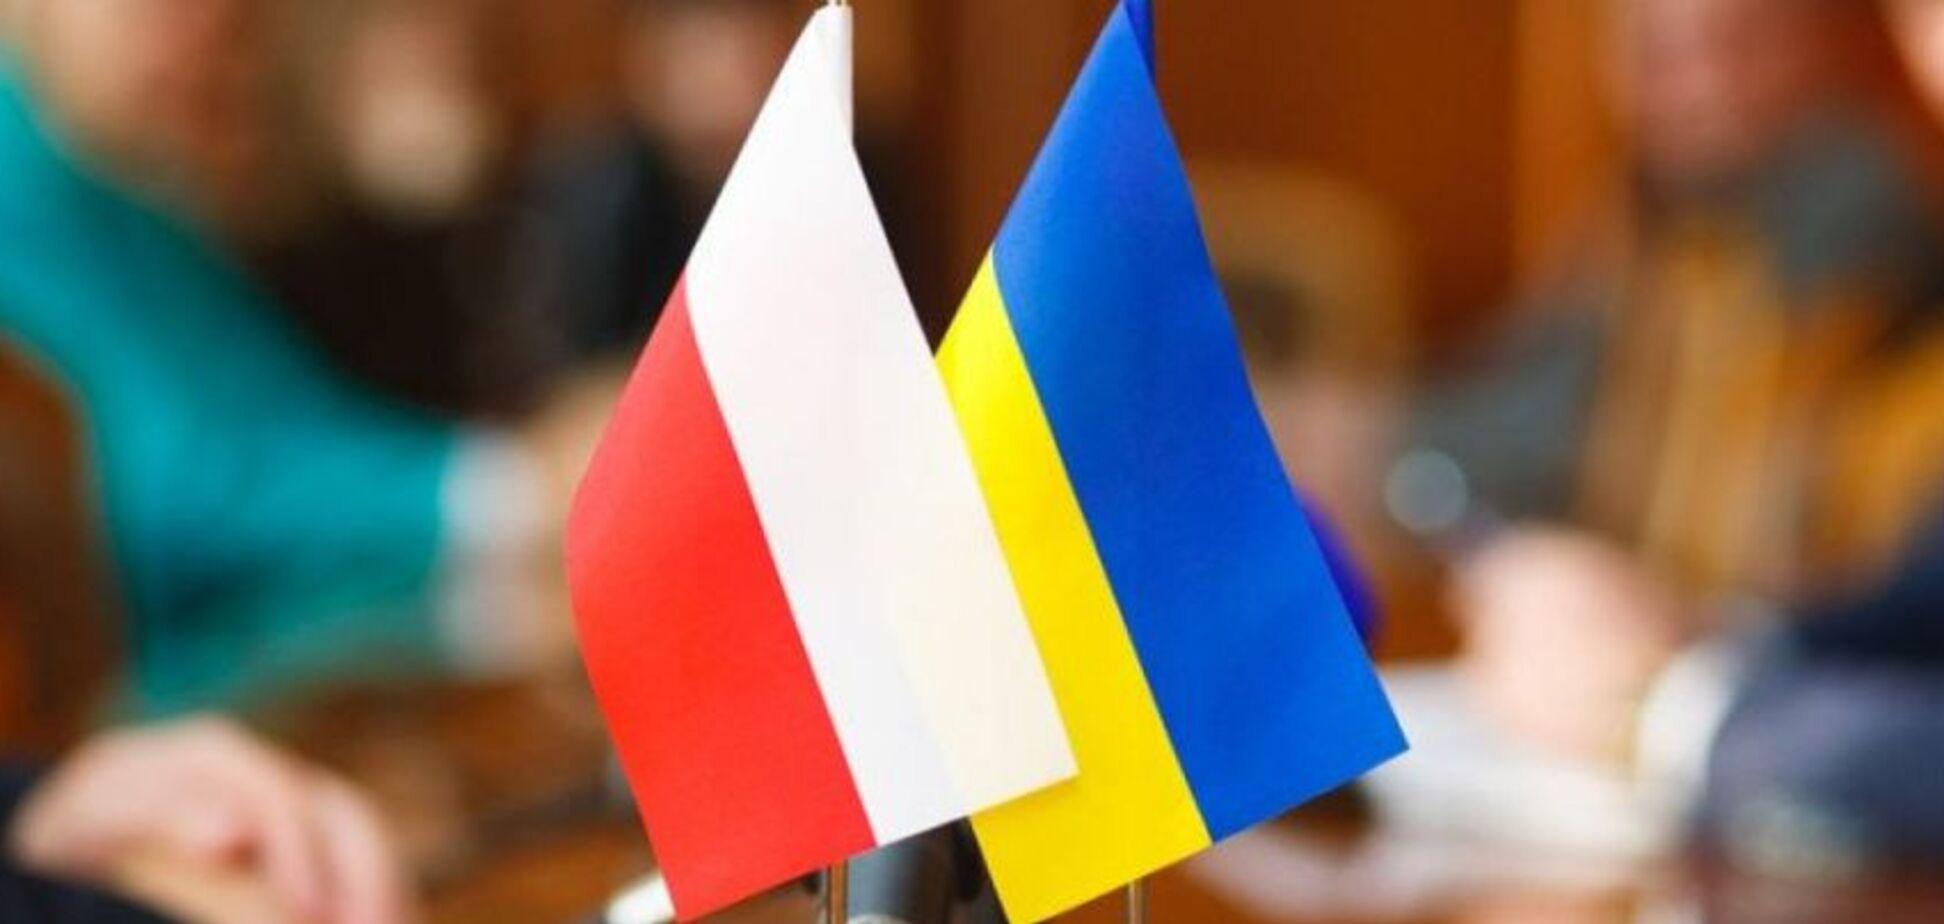 Польща вкотре стала на бік України